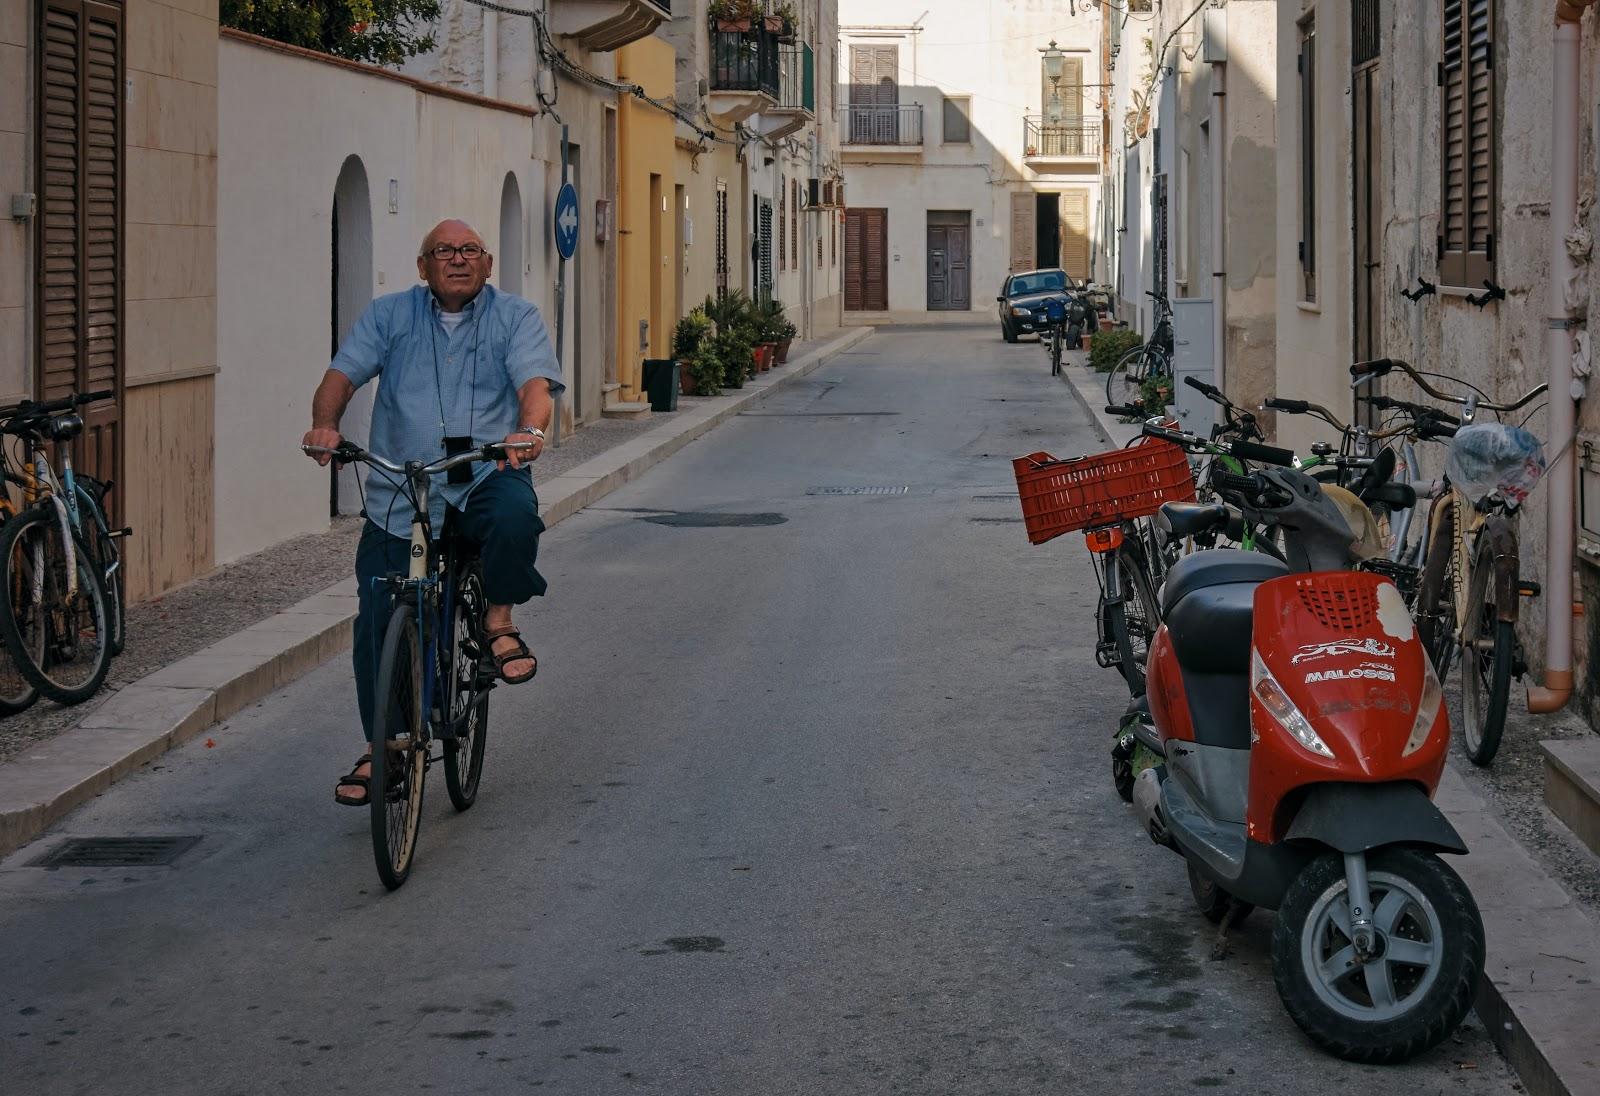 droomhuis op Sicilië lokale cultuur